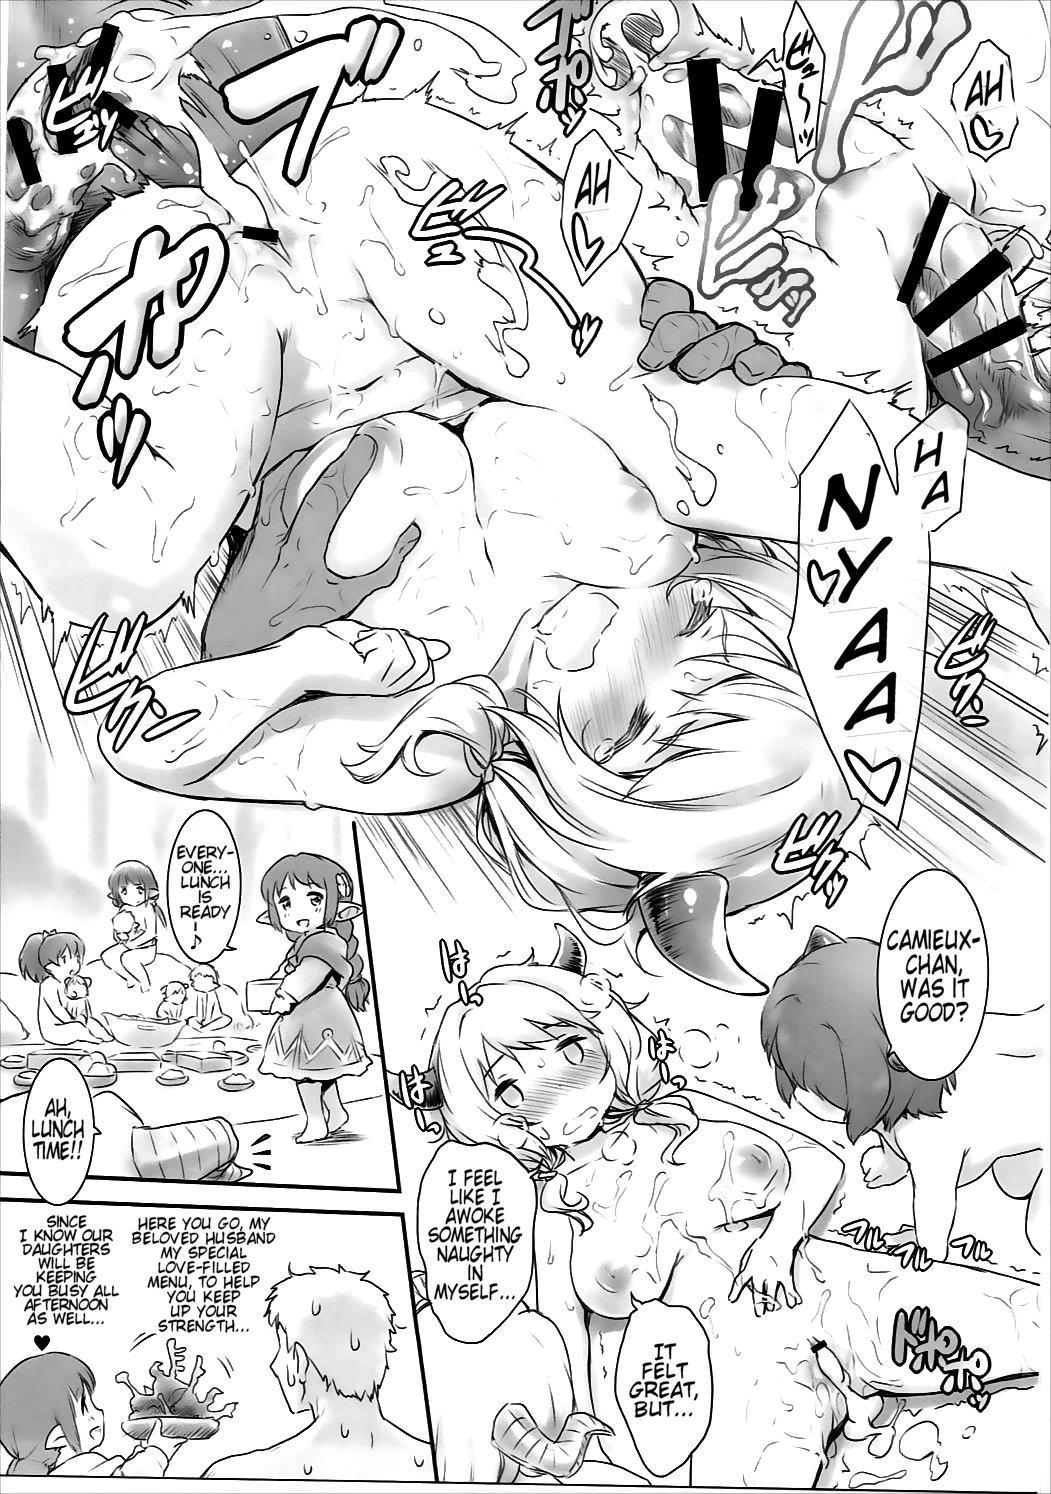 [ASGO (Zanzi)] Rei no Shima ni Draph ga Futtekita. (Kouhen)   On A Certain Island, Draph Rain From The Sky (Part Two) (Granblue Fantasy) [English] [Tremalkinger] [Digital] 25